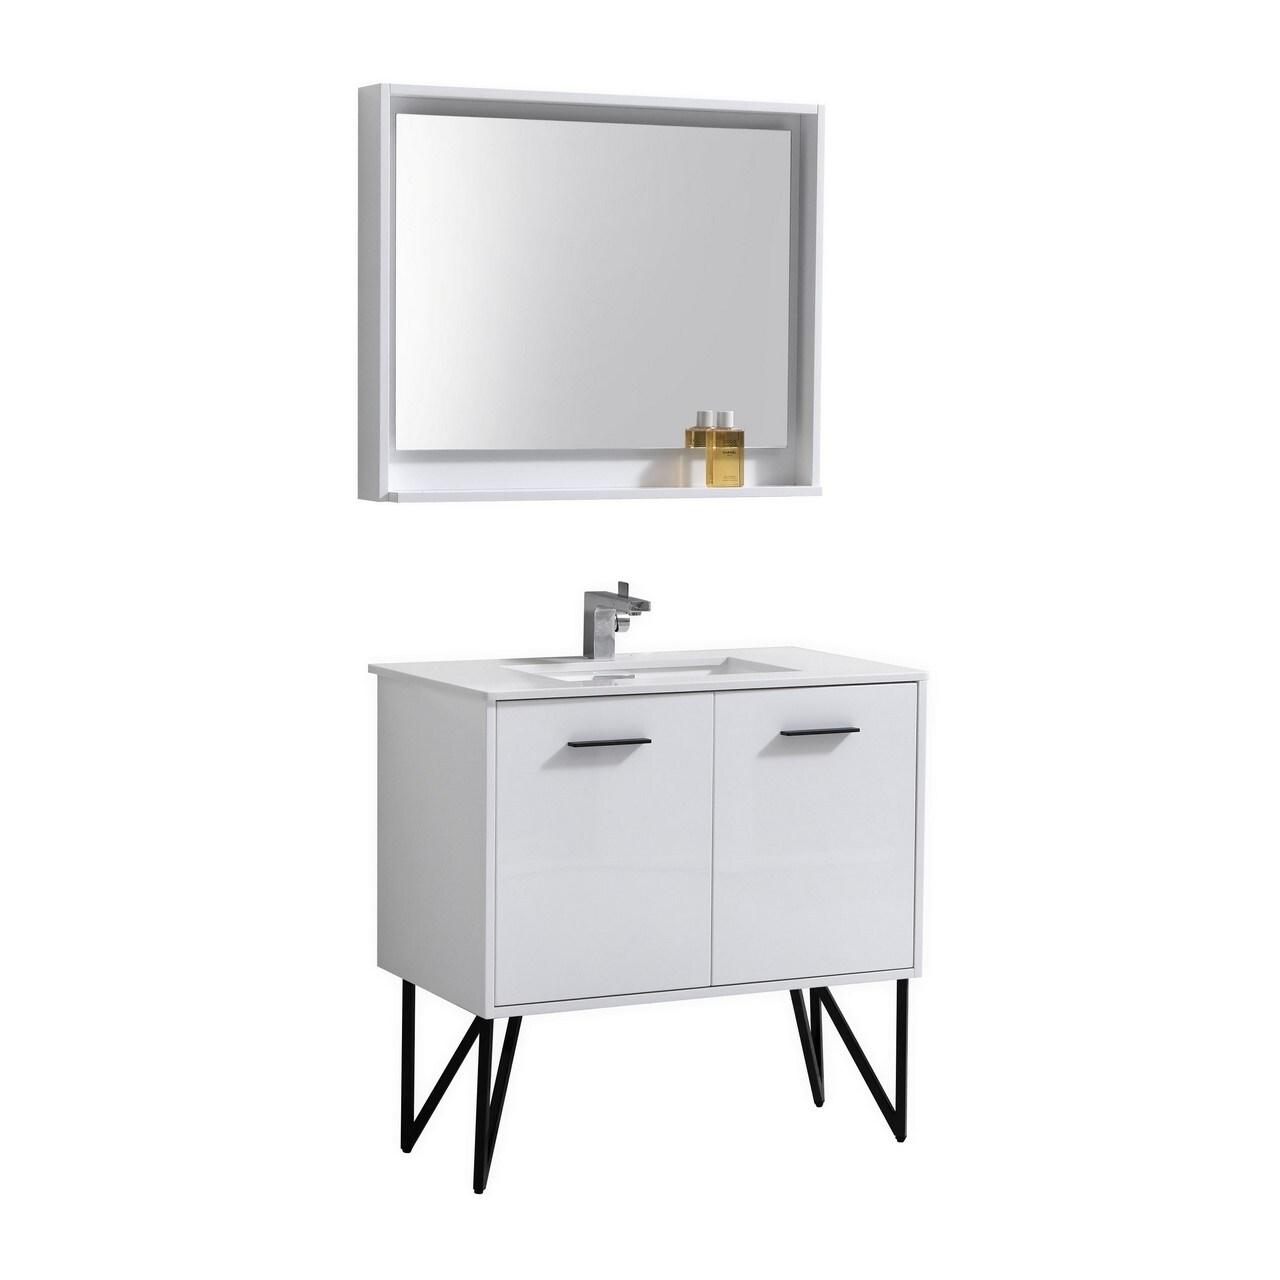 Bosco 36 High Gloss White Modern Bathroom Vanity W Quartz Countertop Overstock 30288539